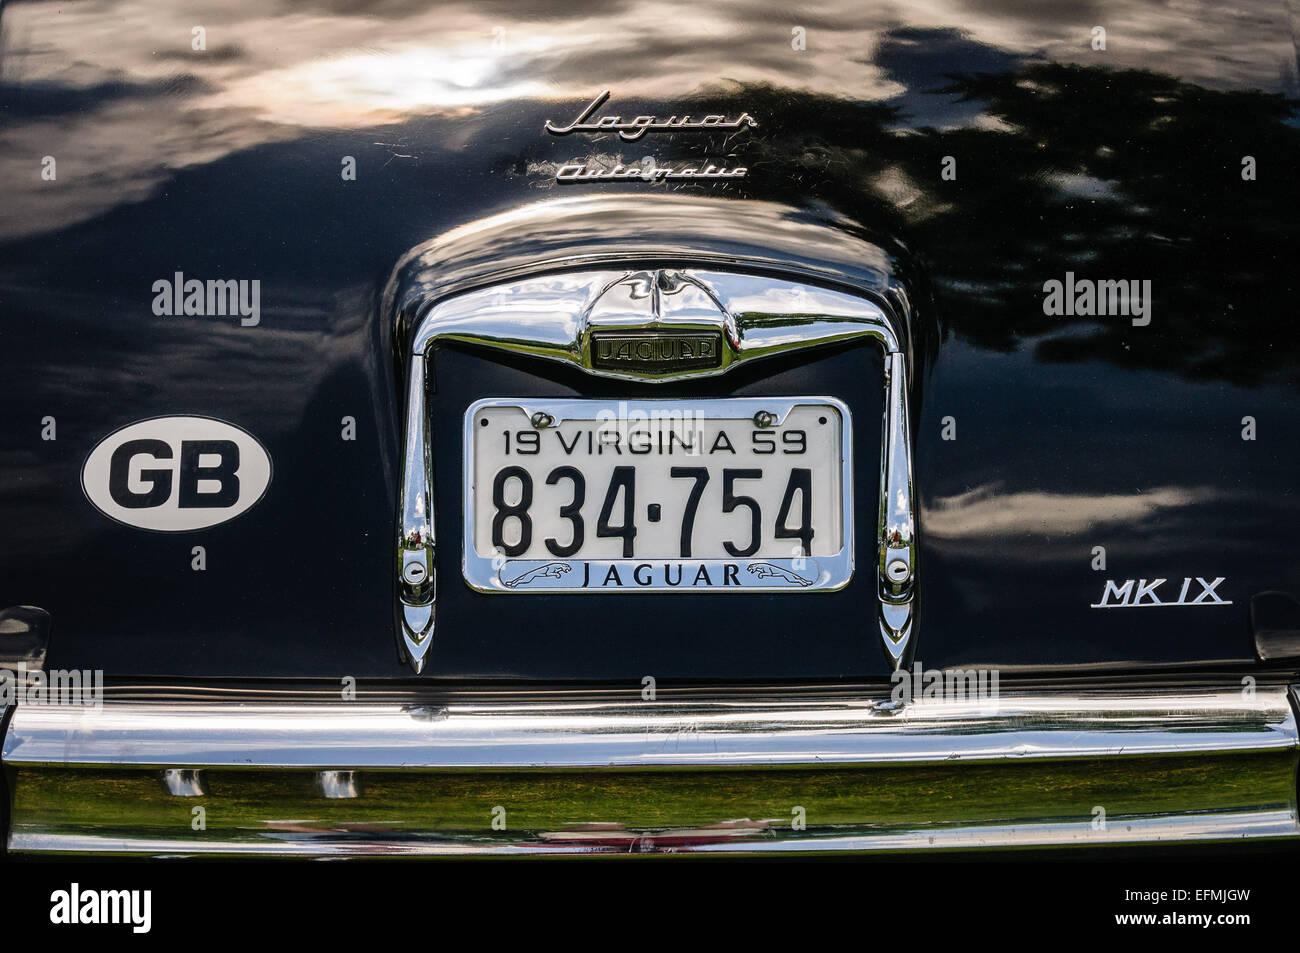 1959 Jaguar Mark IX, Antique Car Show, Sully Local Histórico, Chantilly,  Virginia